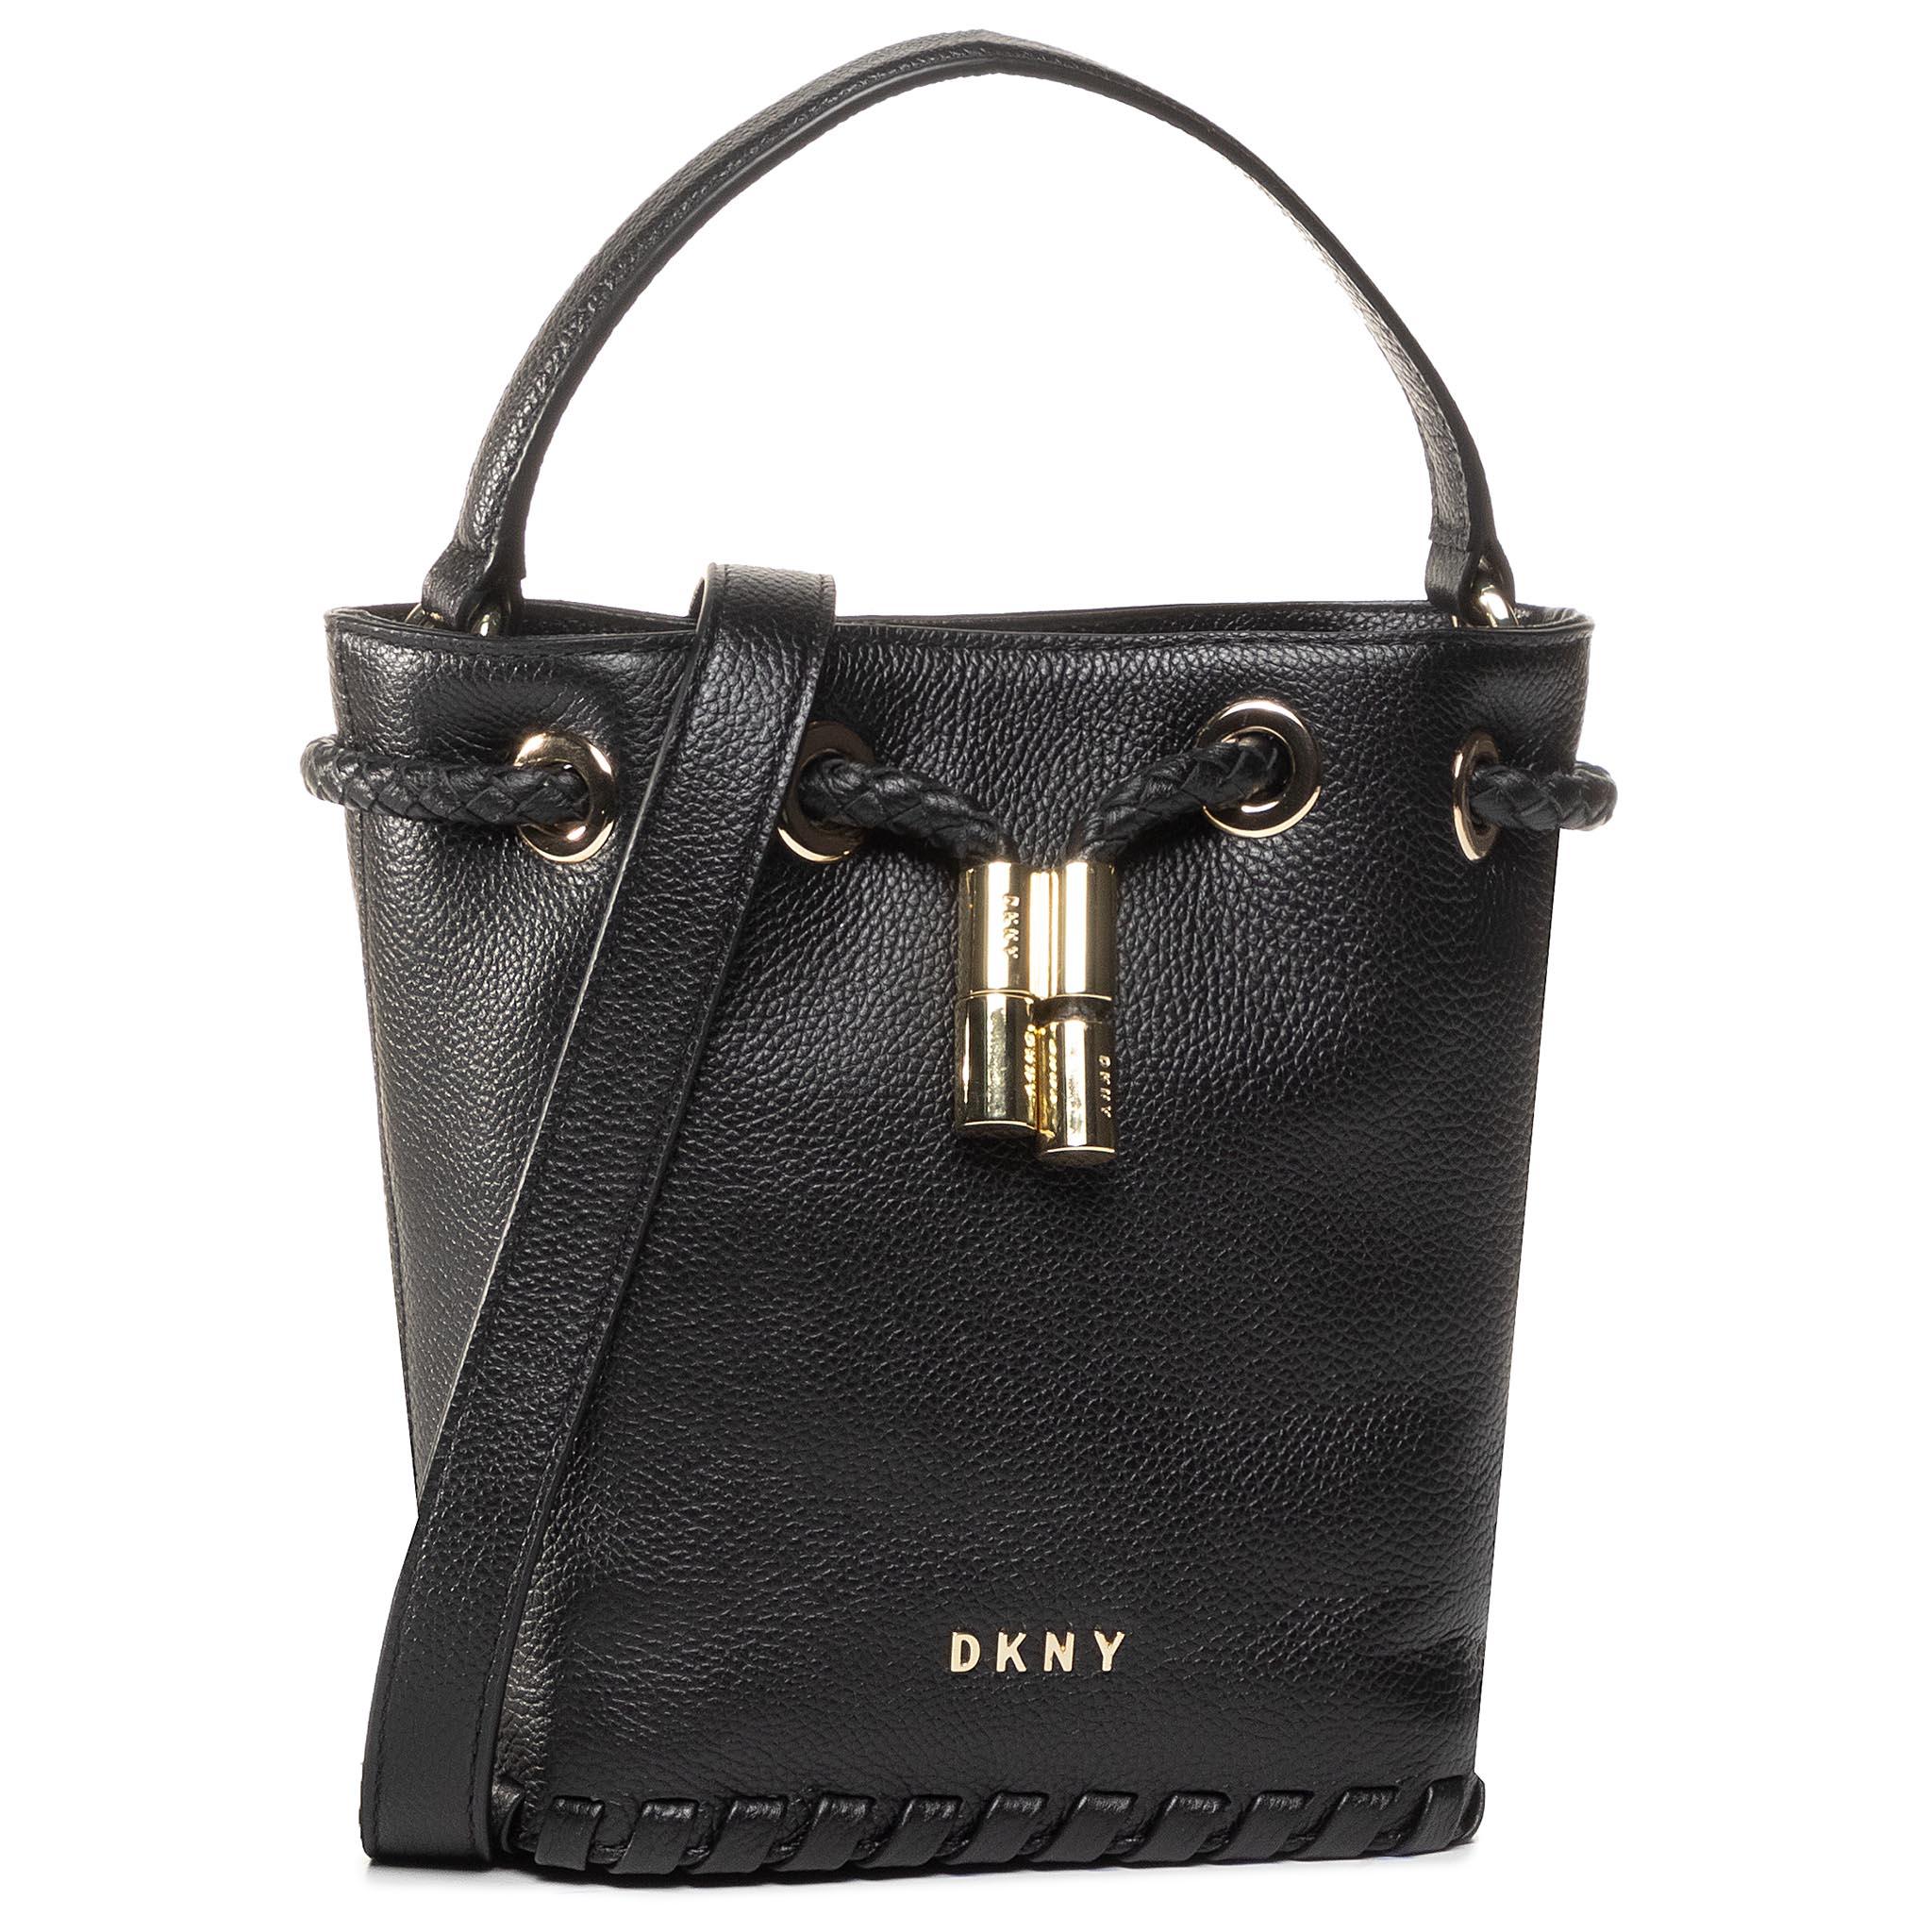 Image of Handtasche DKNY - Winnie Sm Bucket R02JUI94 Blk/Gold BGD